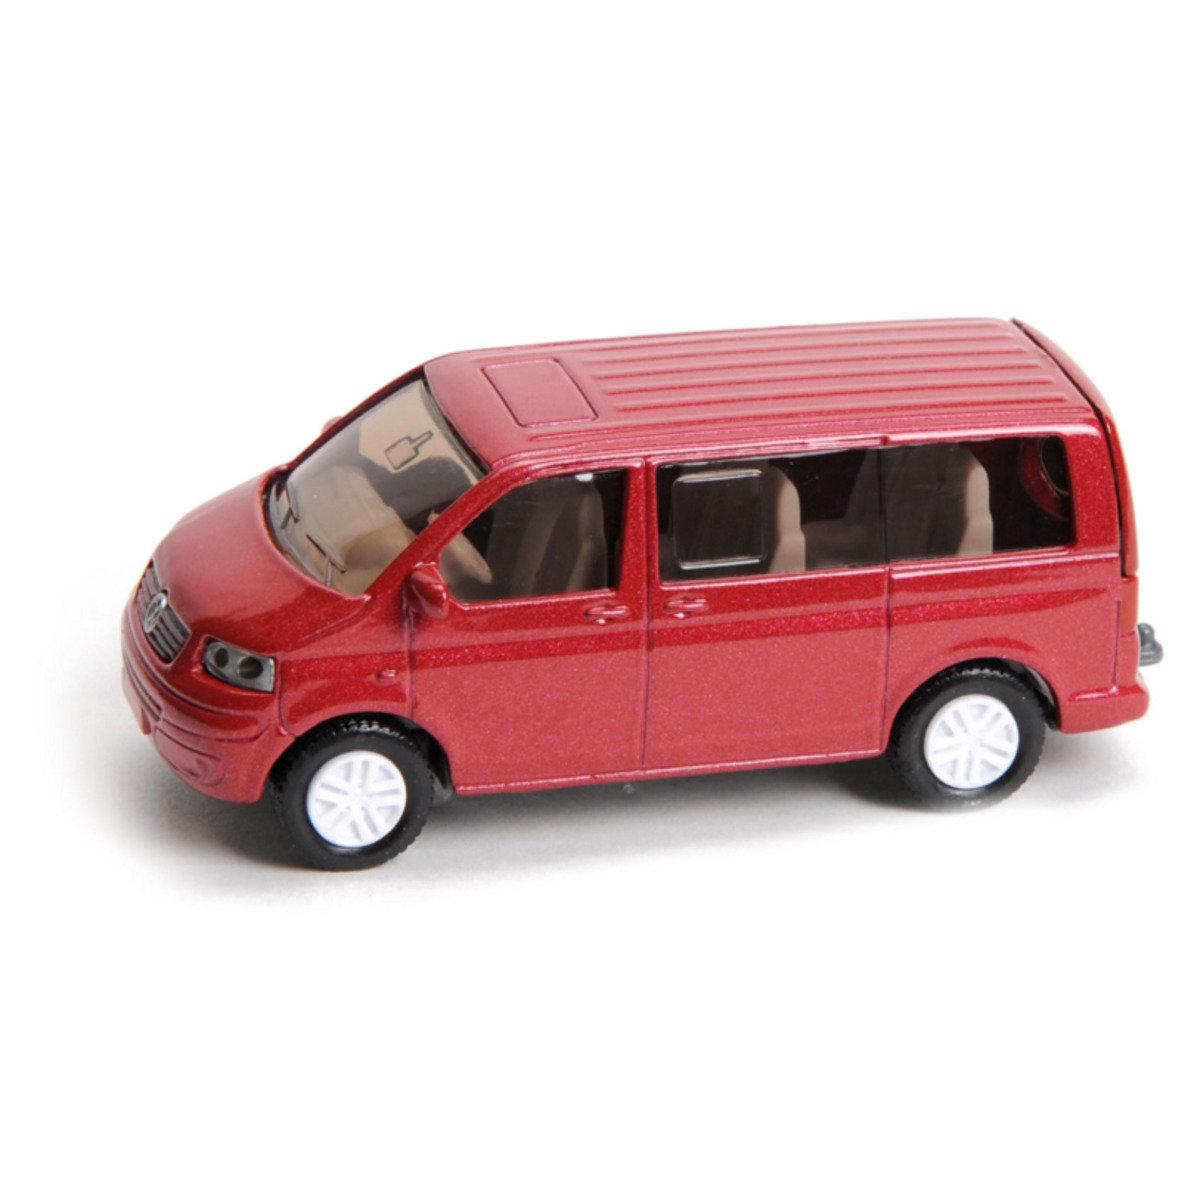 1070 VW Multivan 大眾商務車